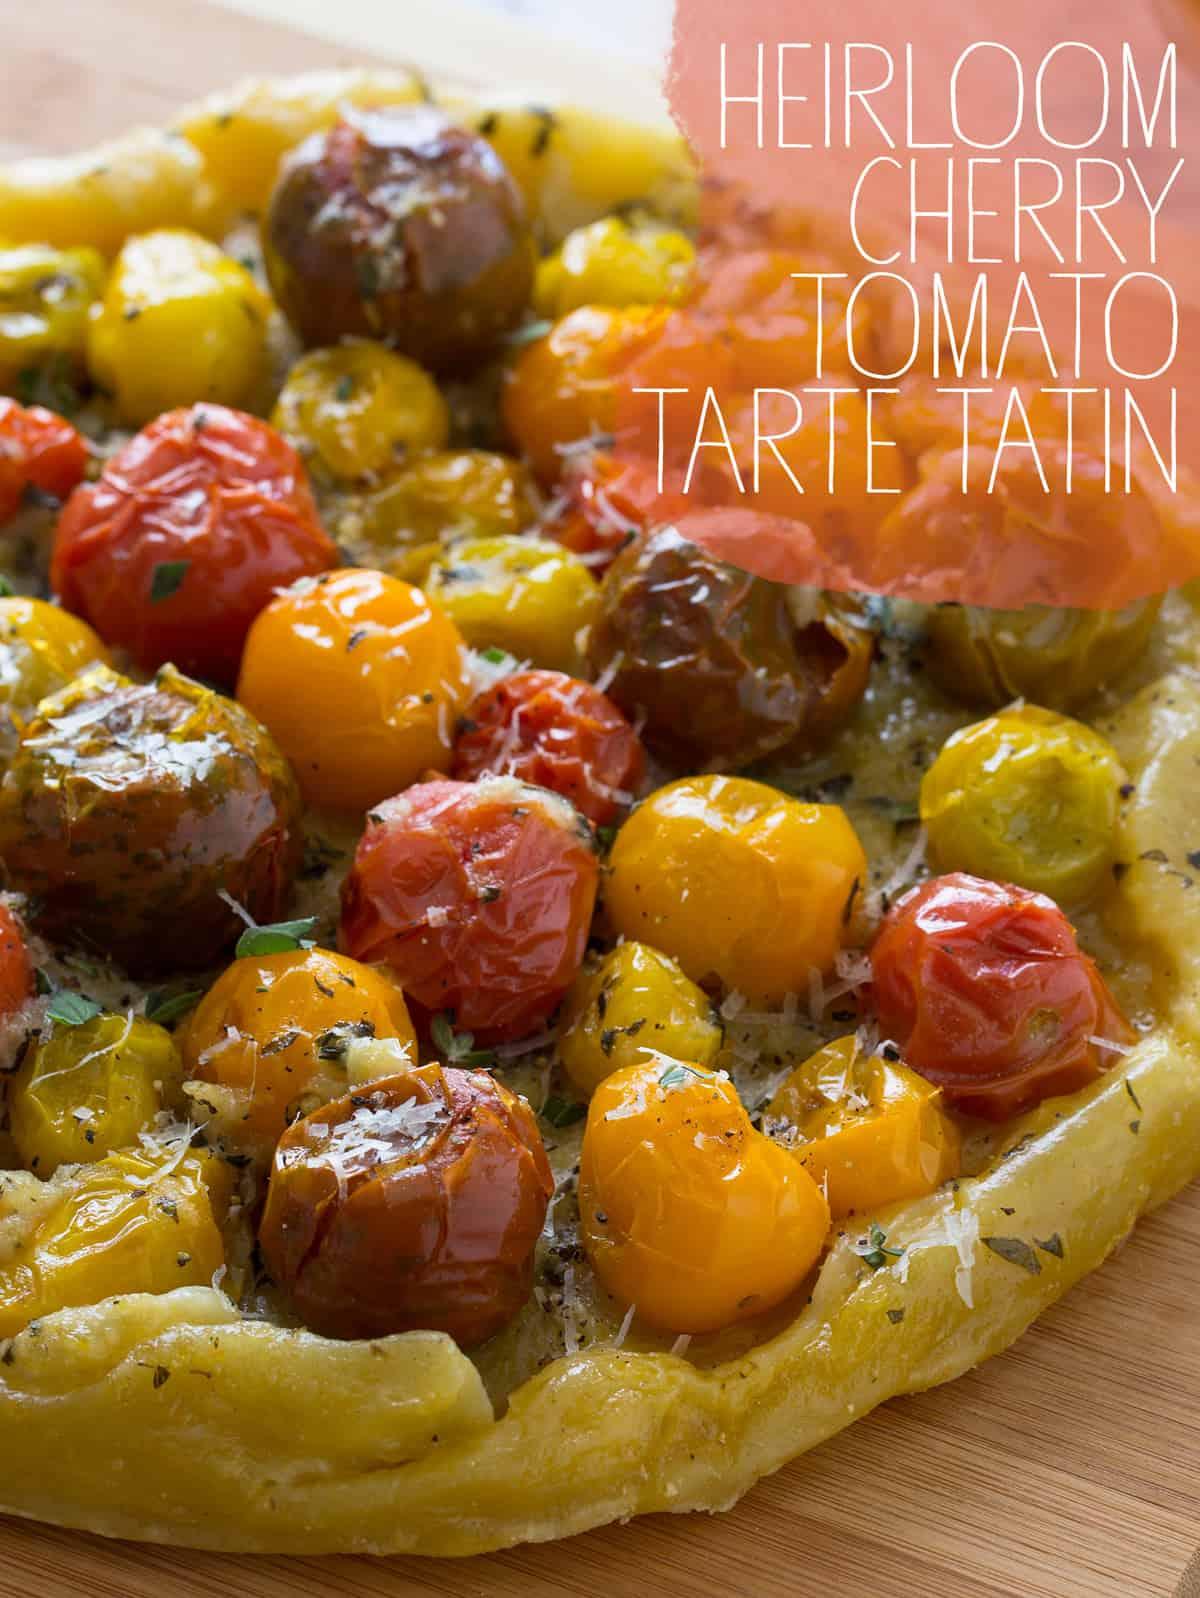 tarte tatin cherry tomato tarte tatin tomato and basil tarte tatin ...